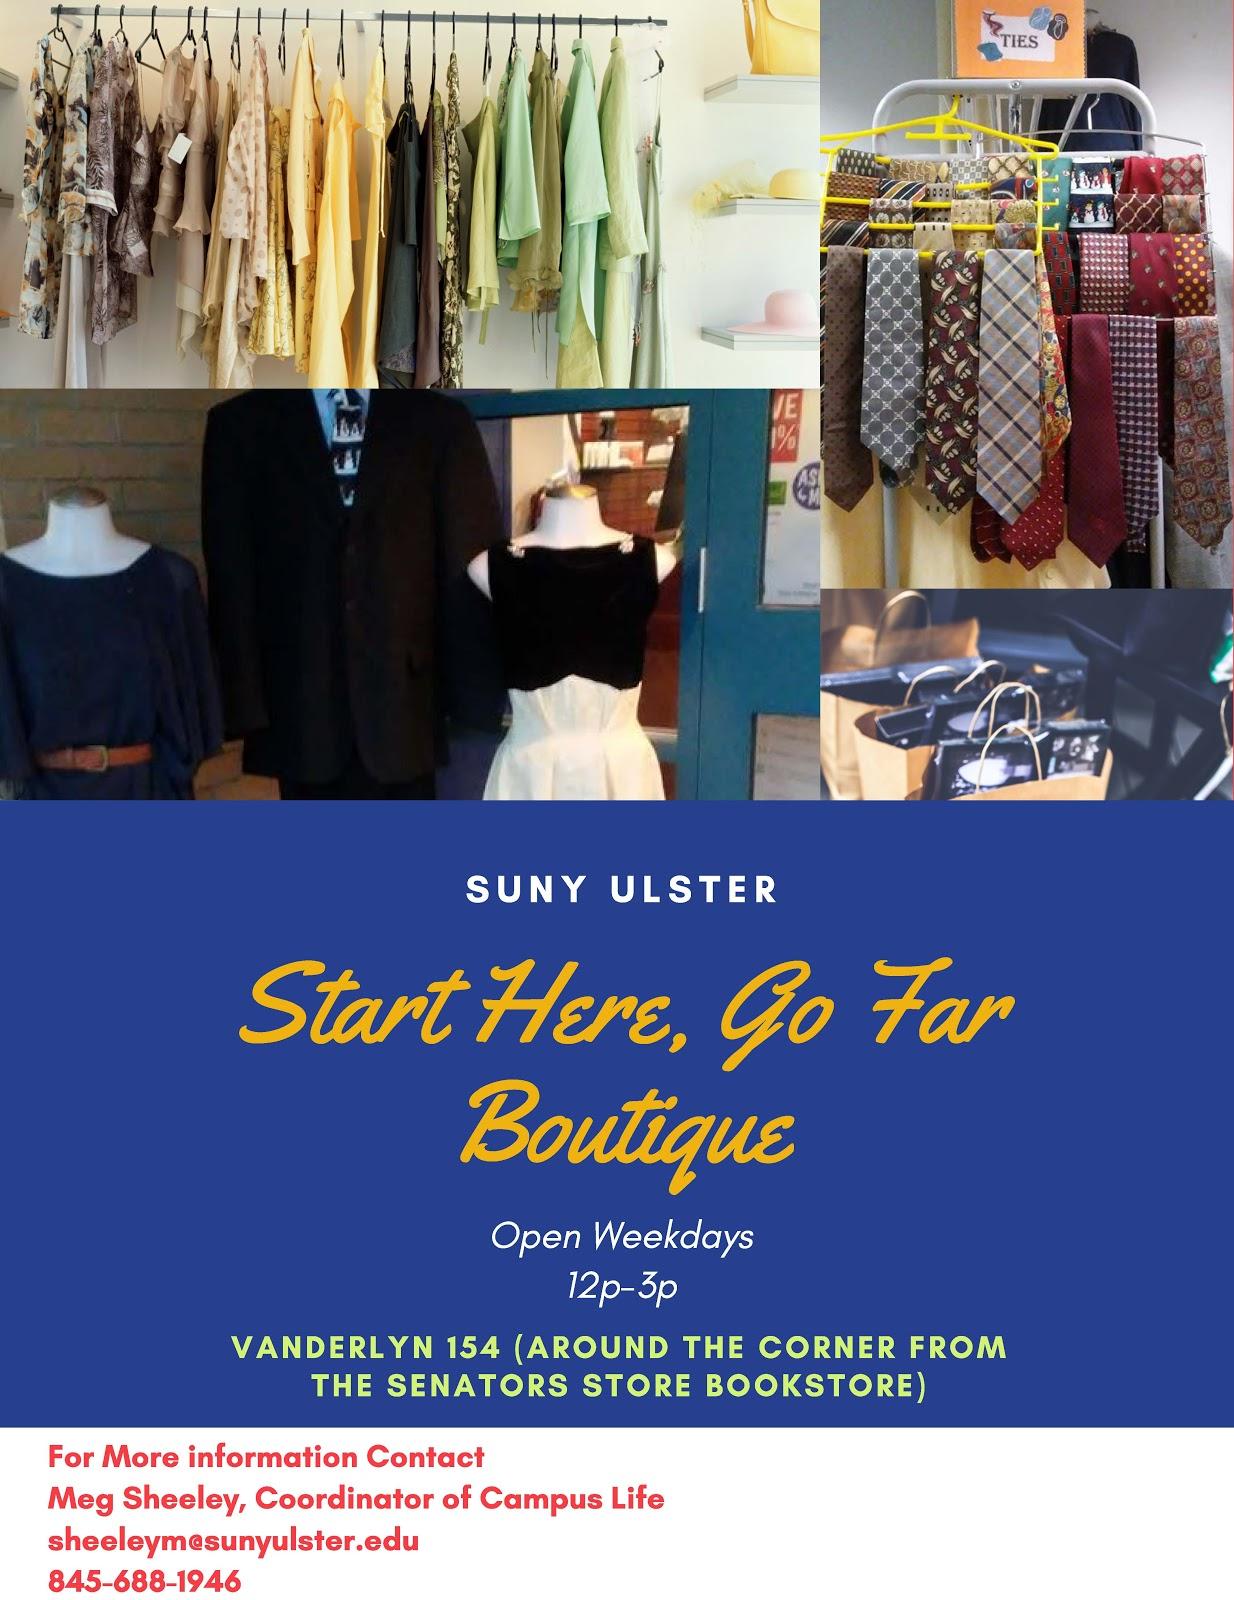 Start Here, Go Far Boutique